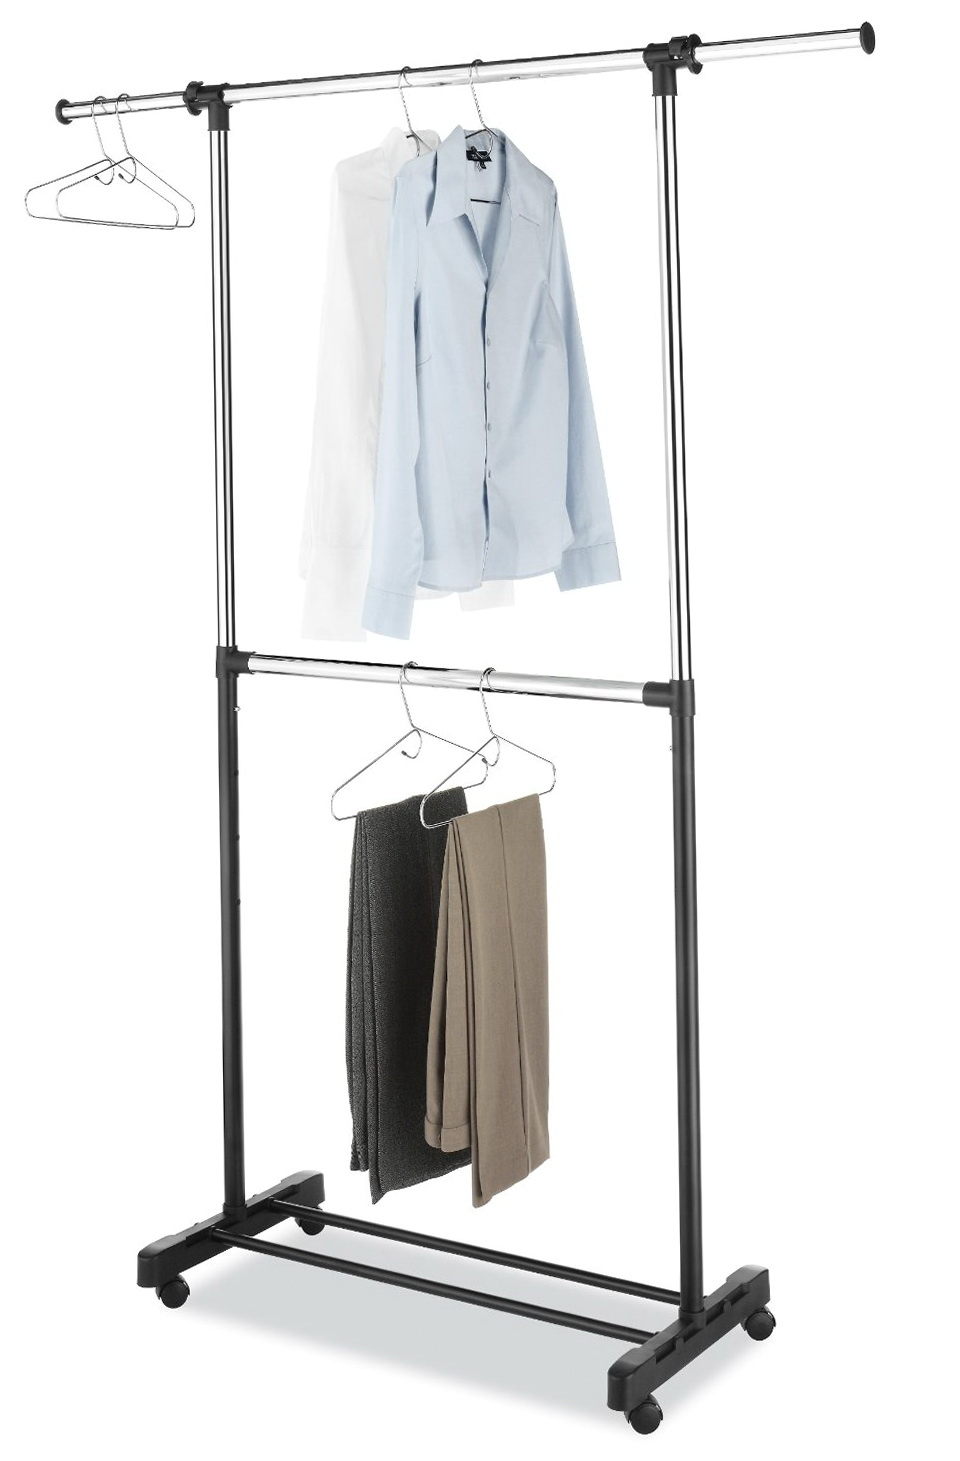 Adjustable Closet Rod Amazon